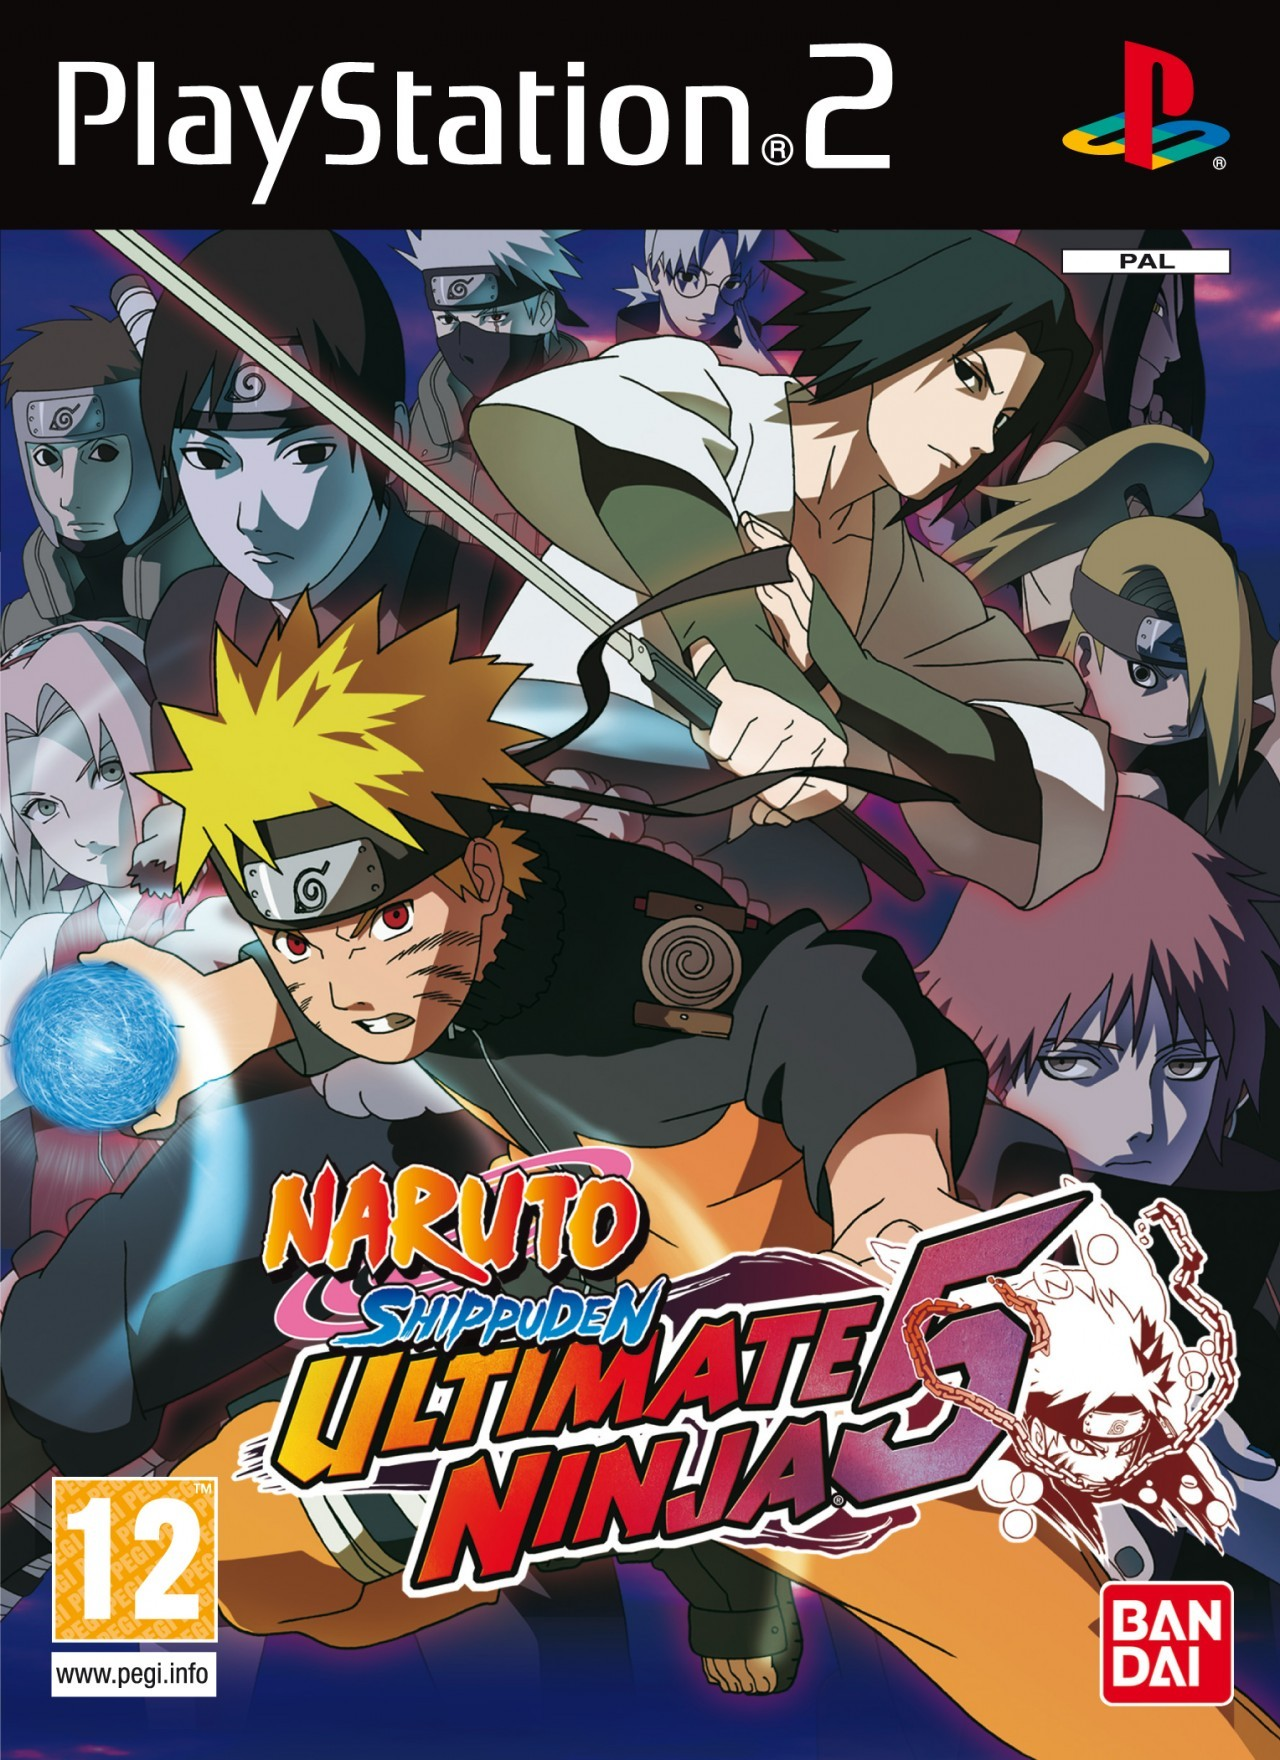 Naruto Shippuden Ultimate Ninja 5 Narutopedia Fandom